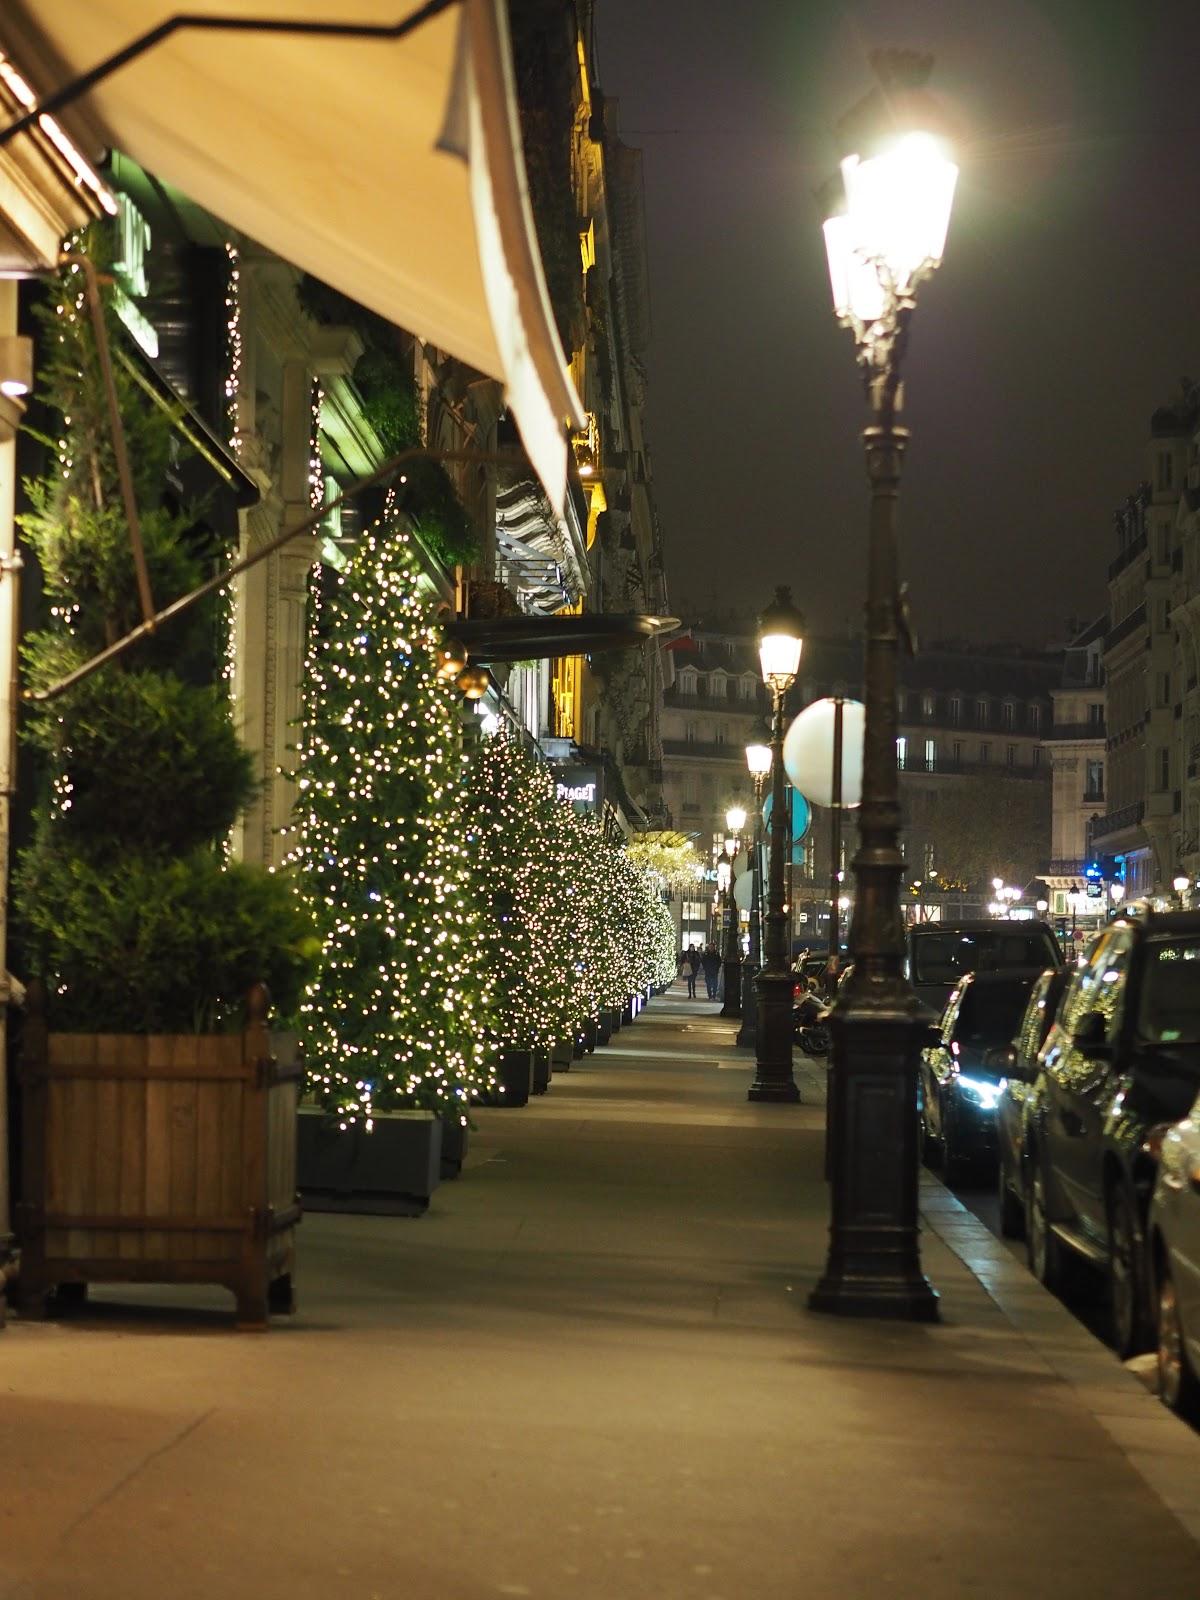 Paris Street at Christmas